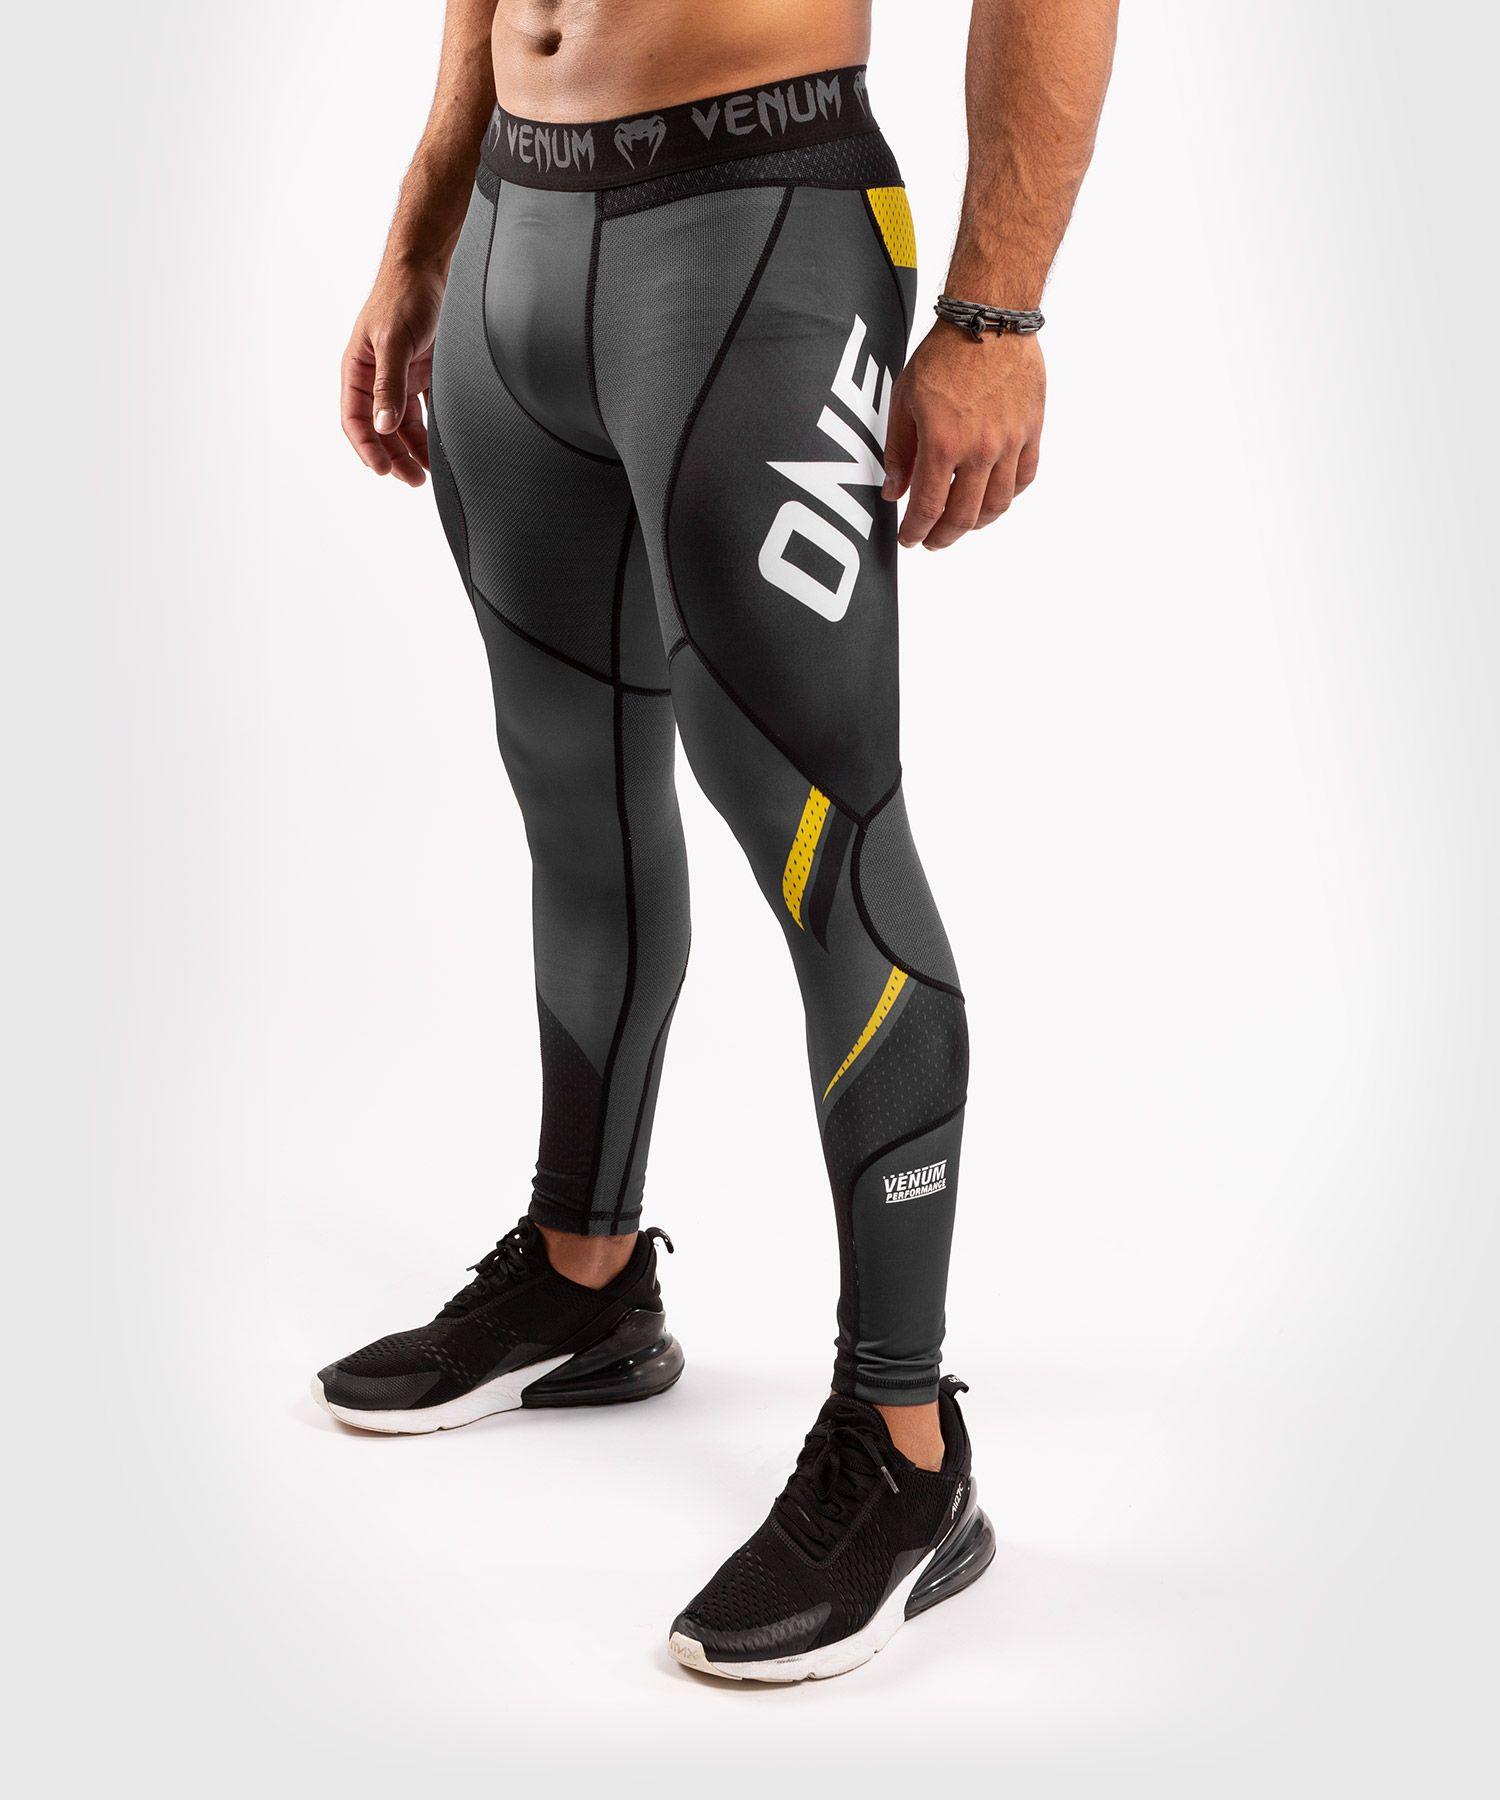 Компрессионные штаны ONE FC Impact  - Серый/Желтый